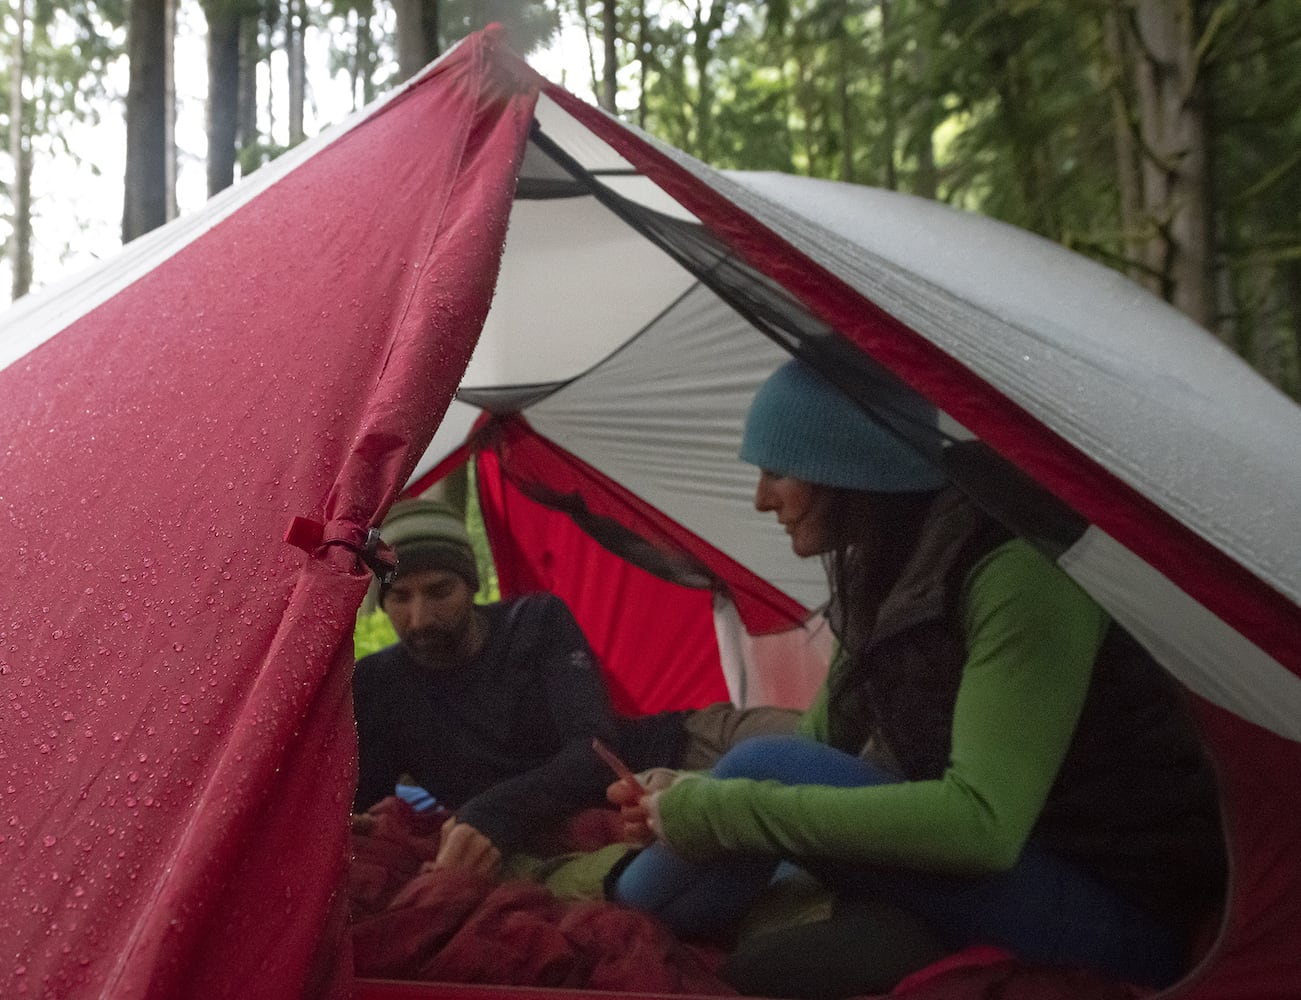 MSR Hubba Hubba NX Freestanding Backpacking Tent